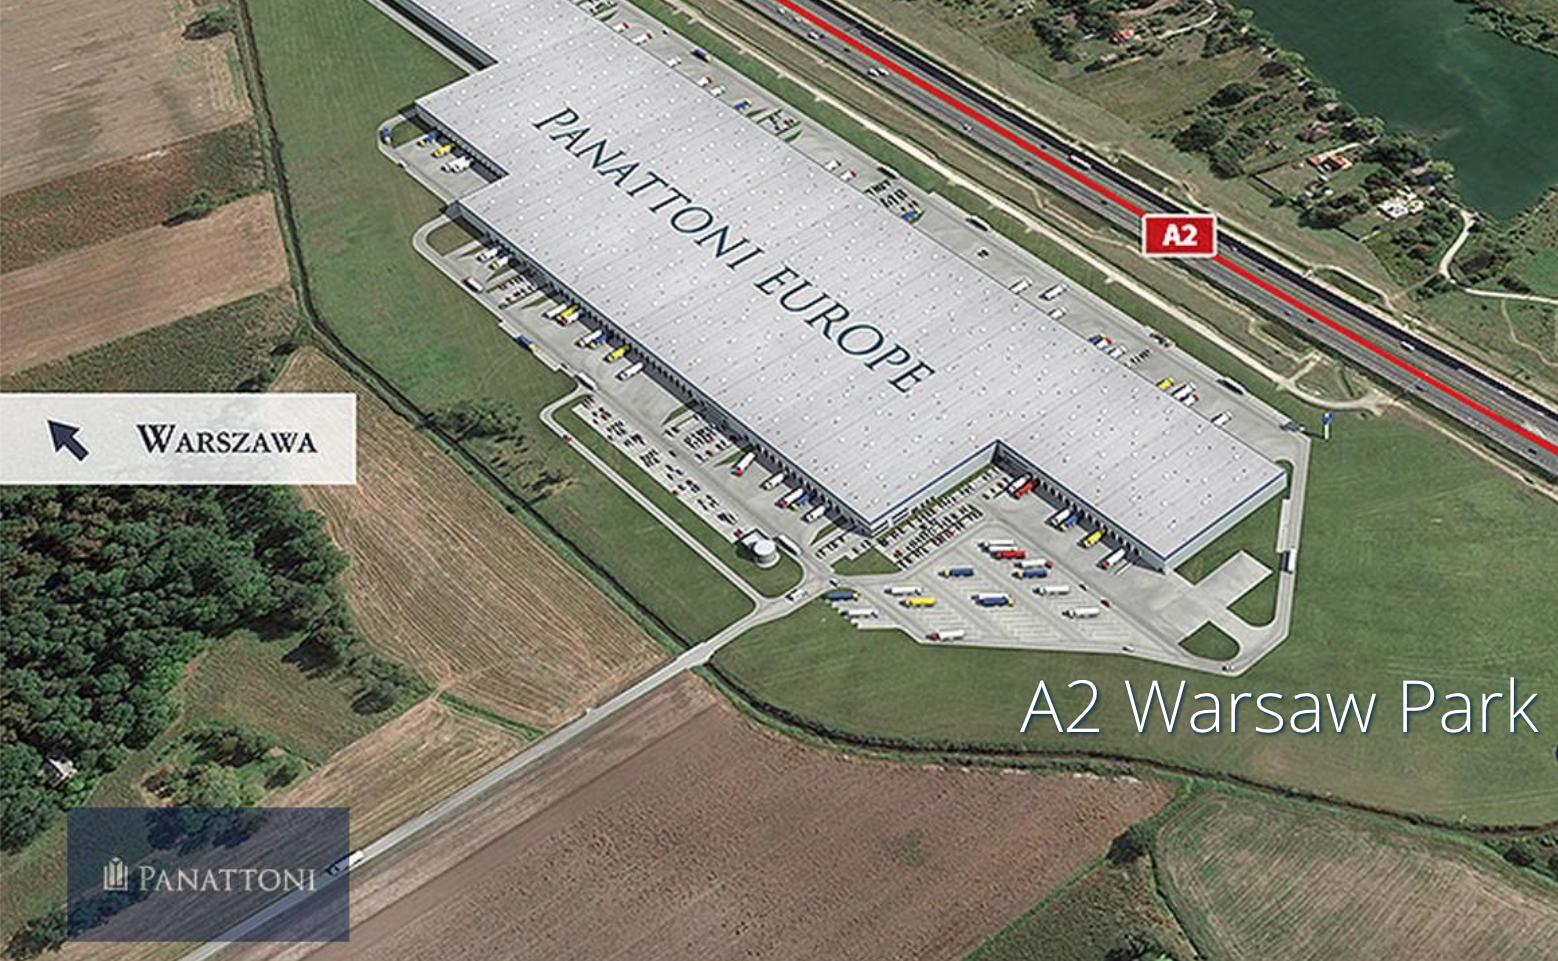 A2 Warsaw Park